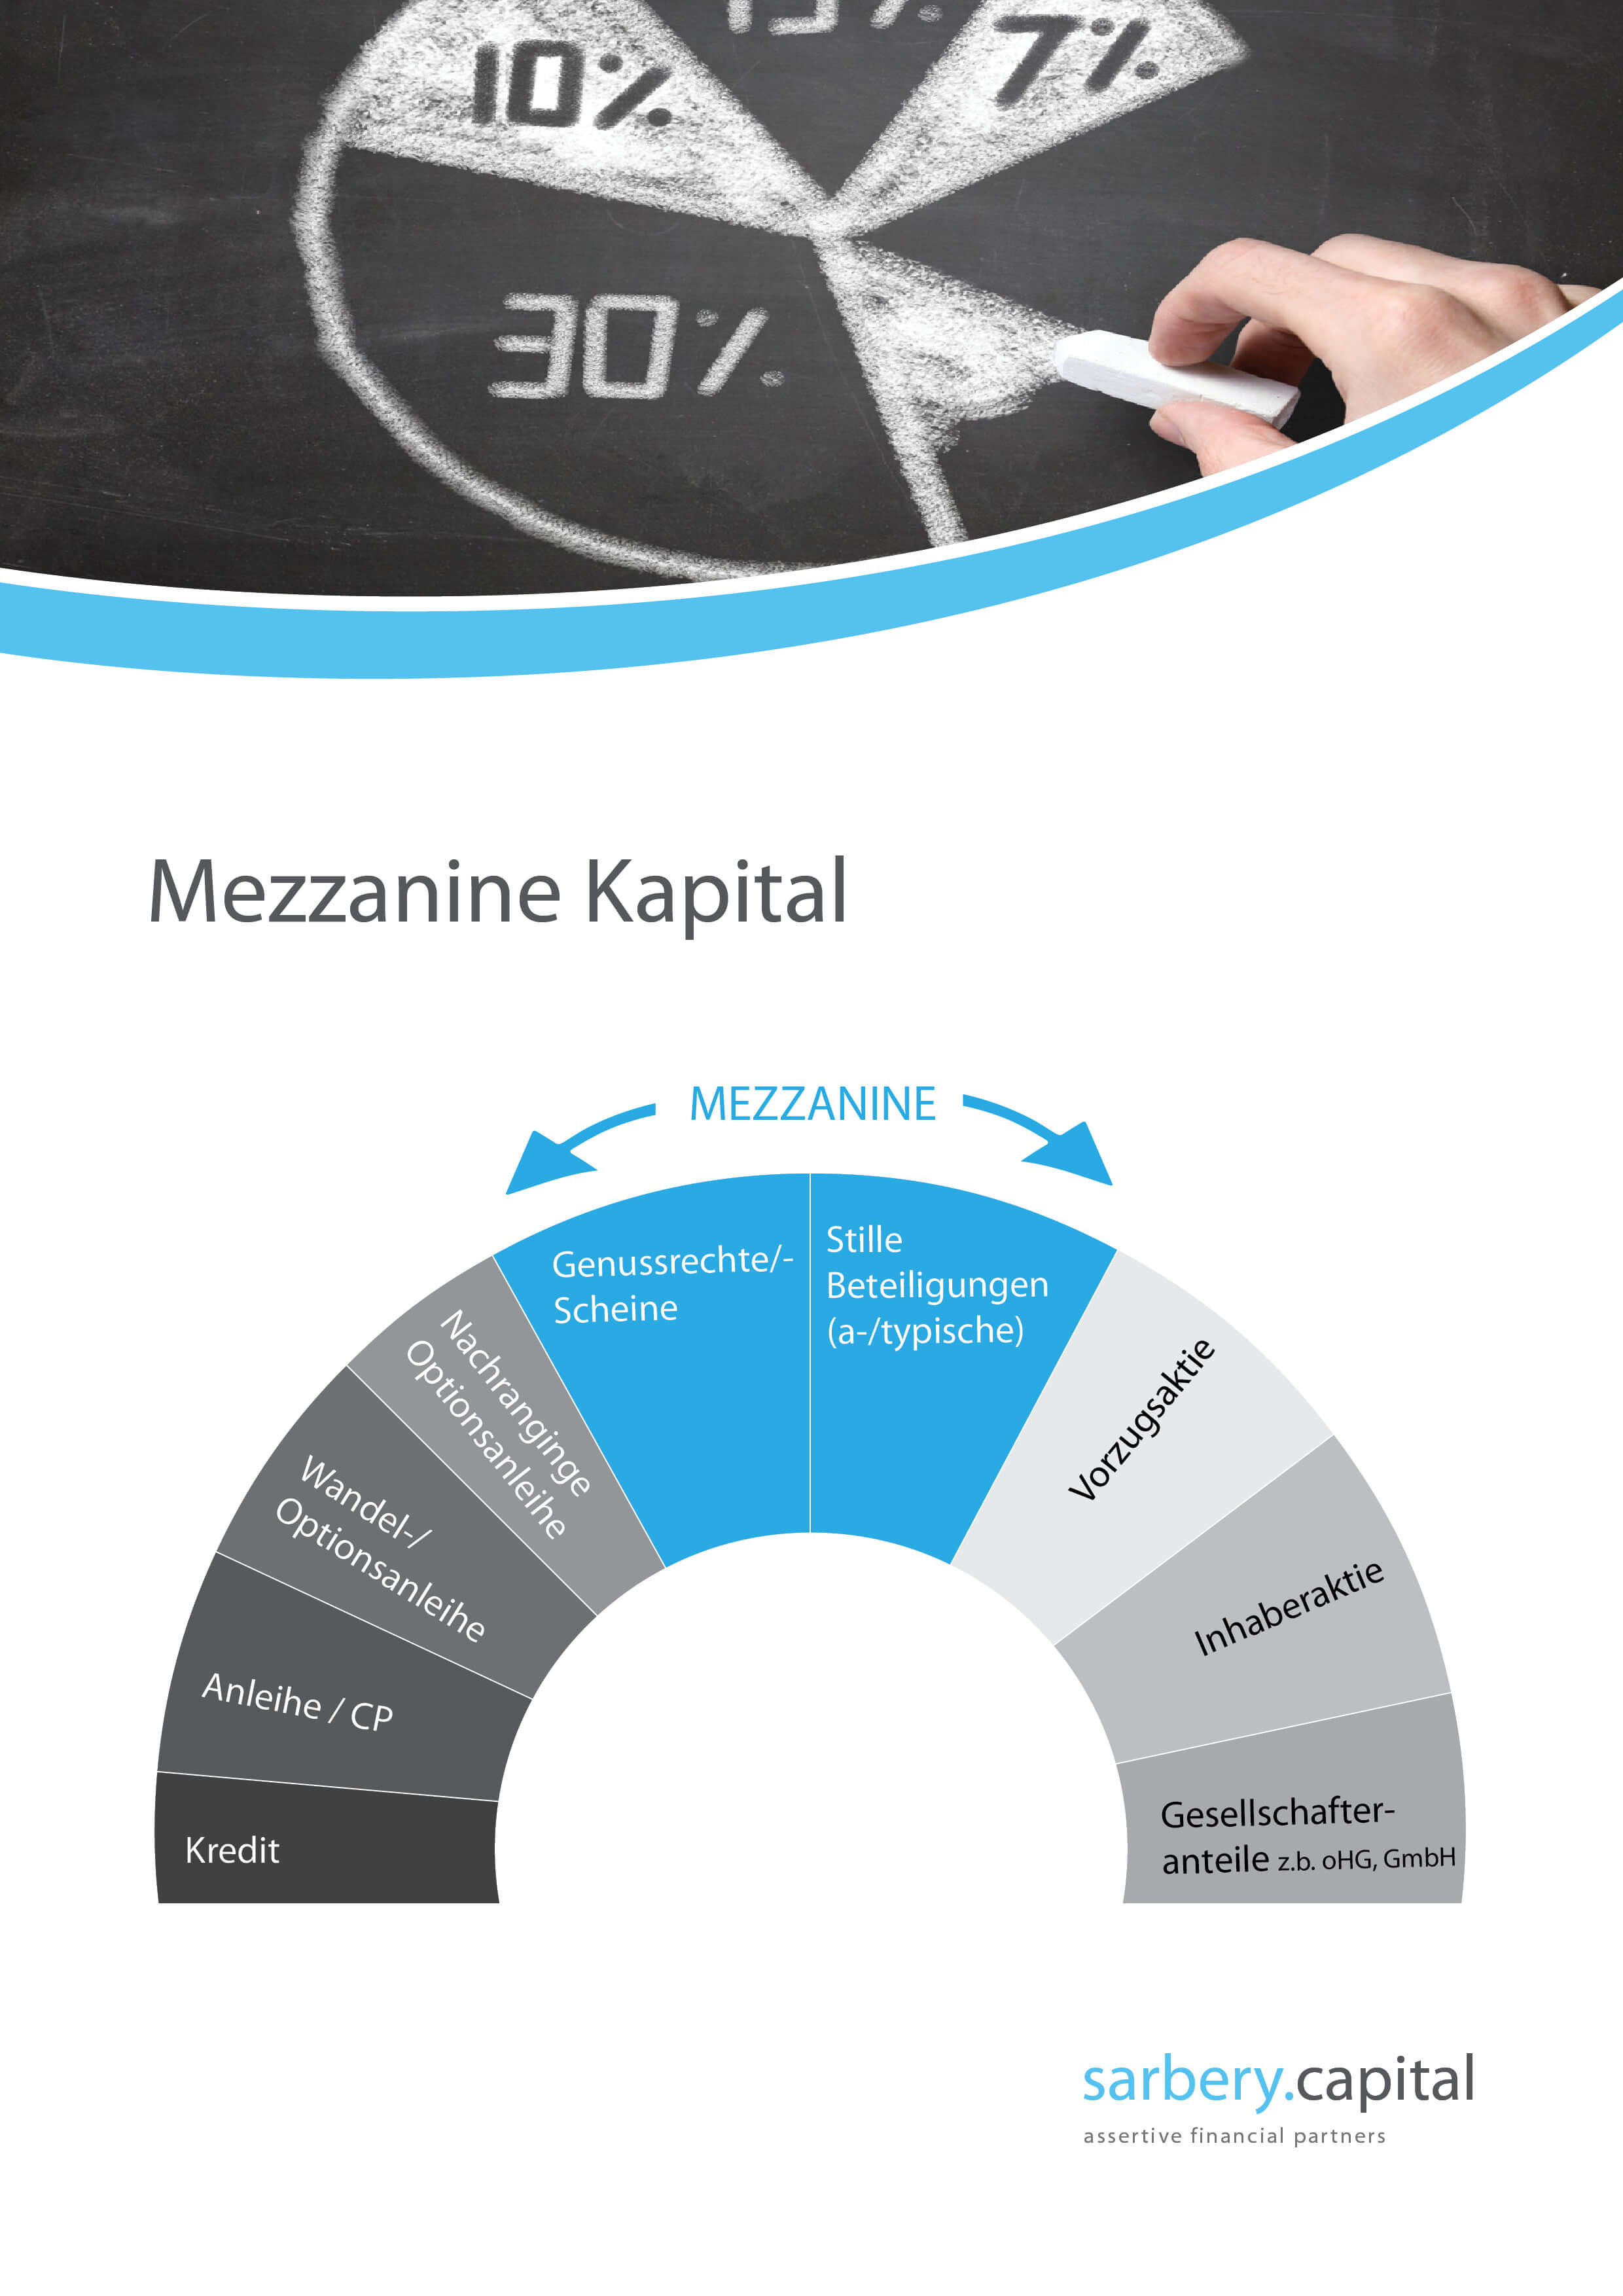 Finanzierung durch Mezzanine Kapital